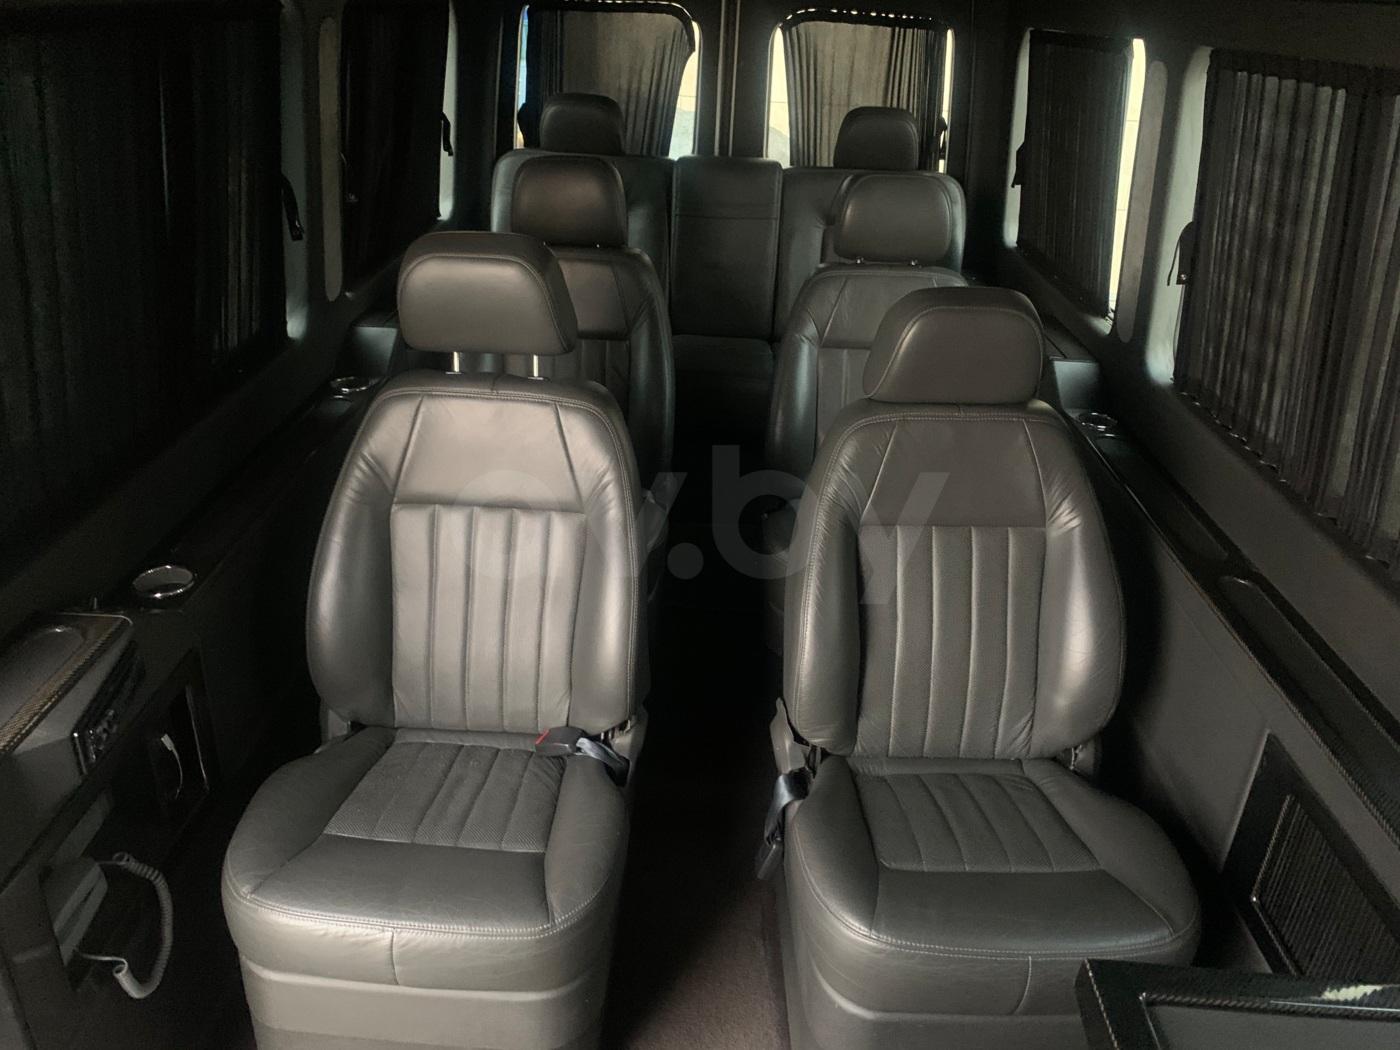 Mercedes-Benz Sprinter 316 VIP, 2011 г.